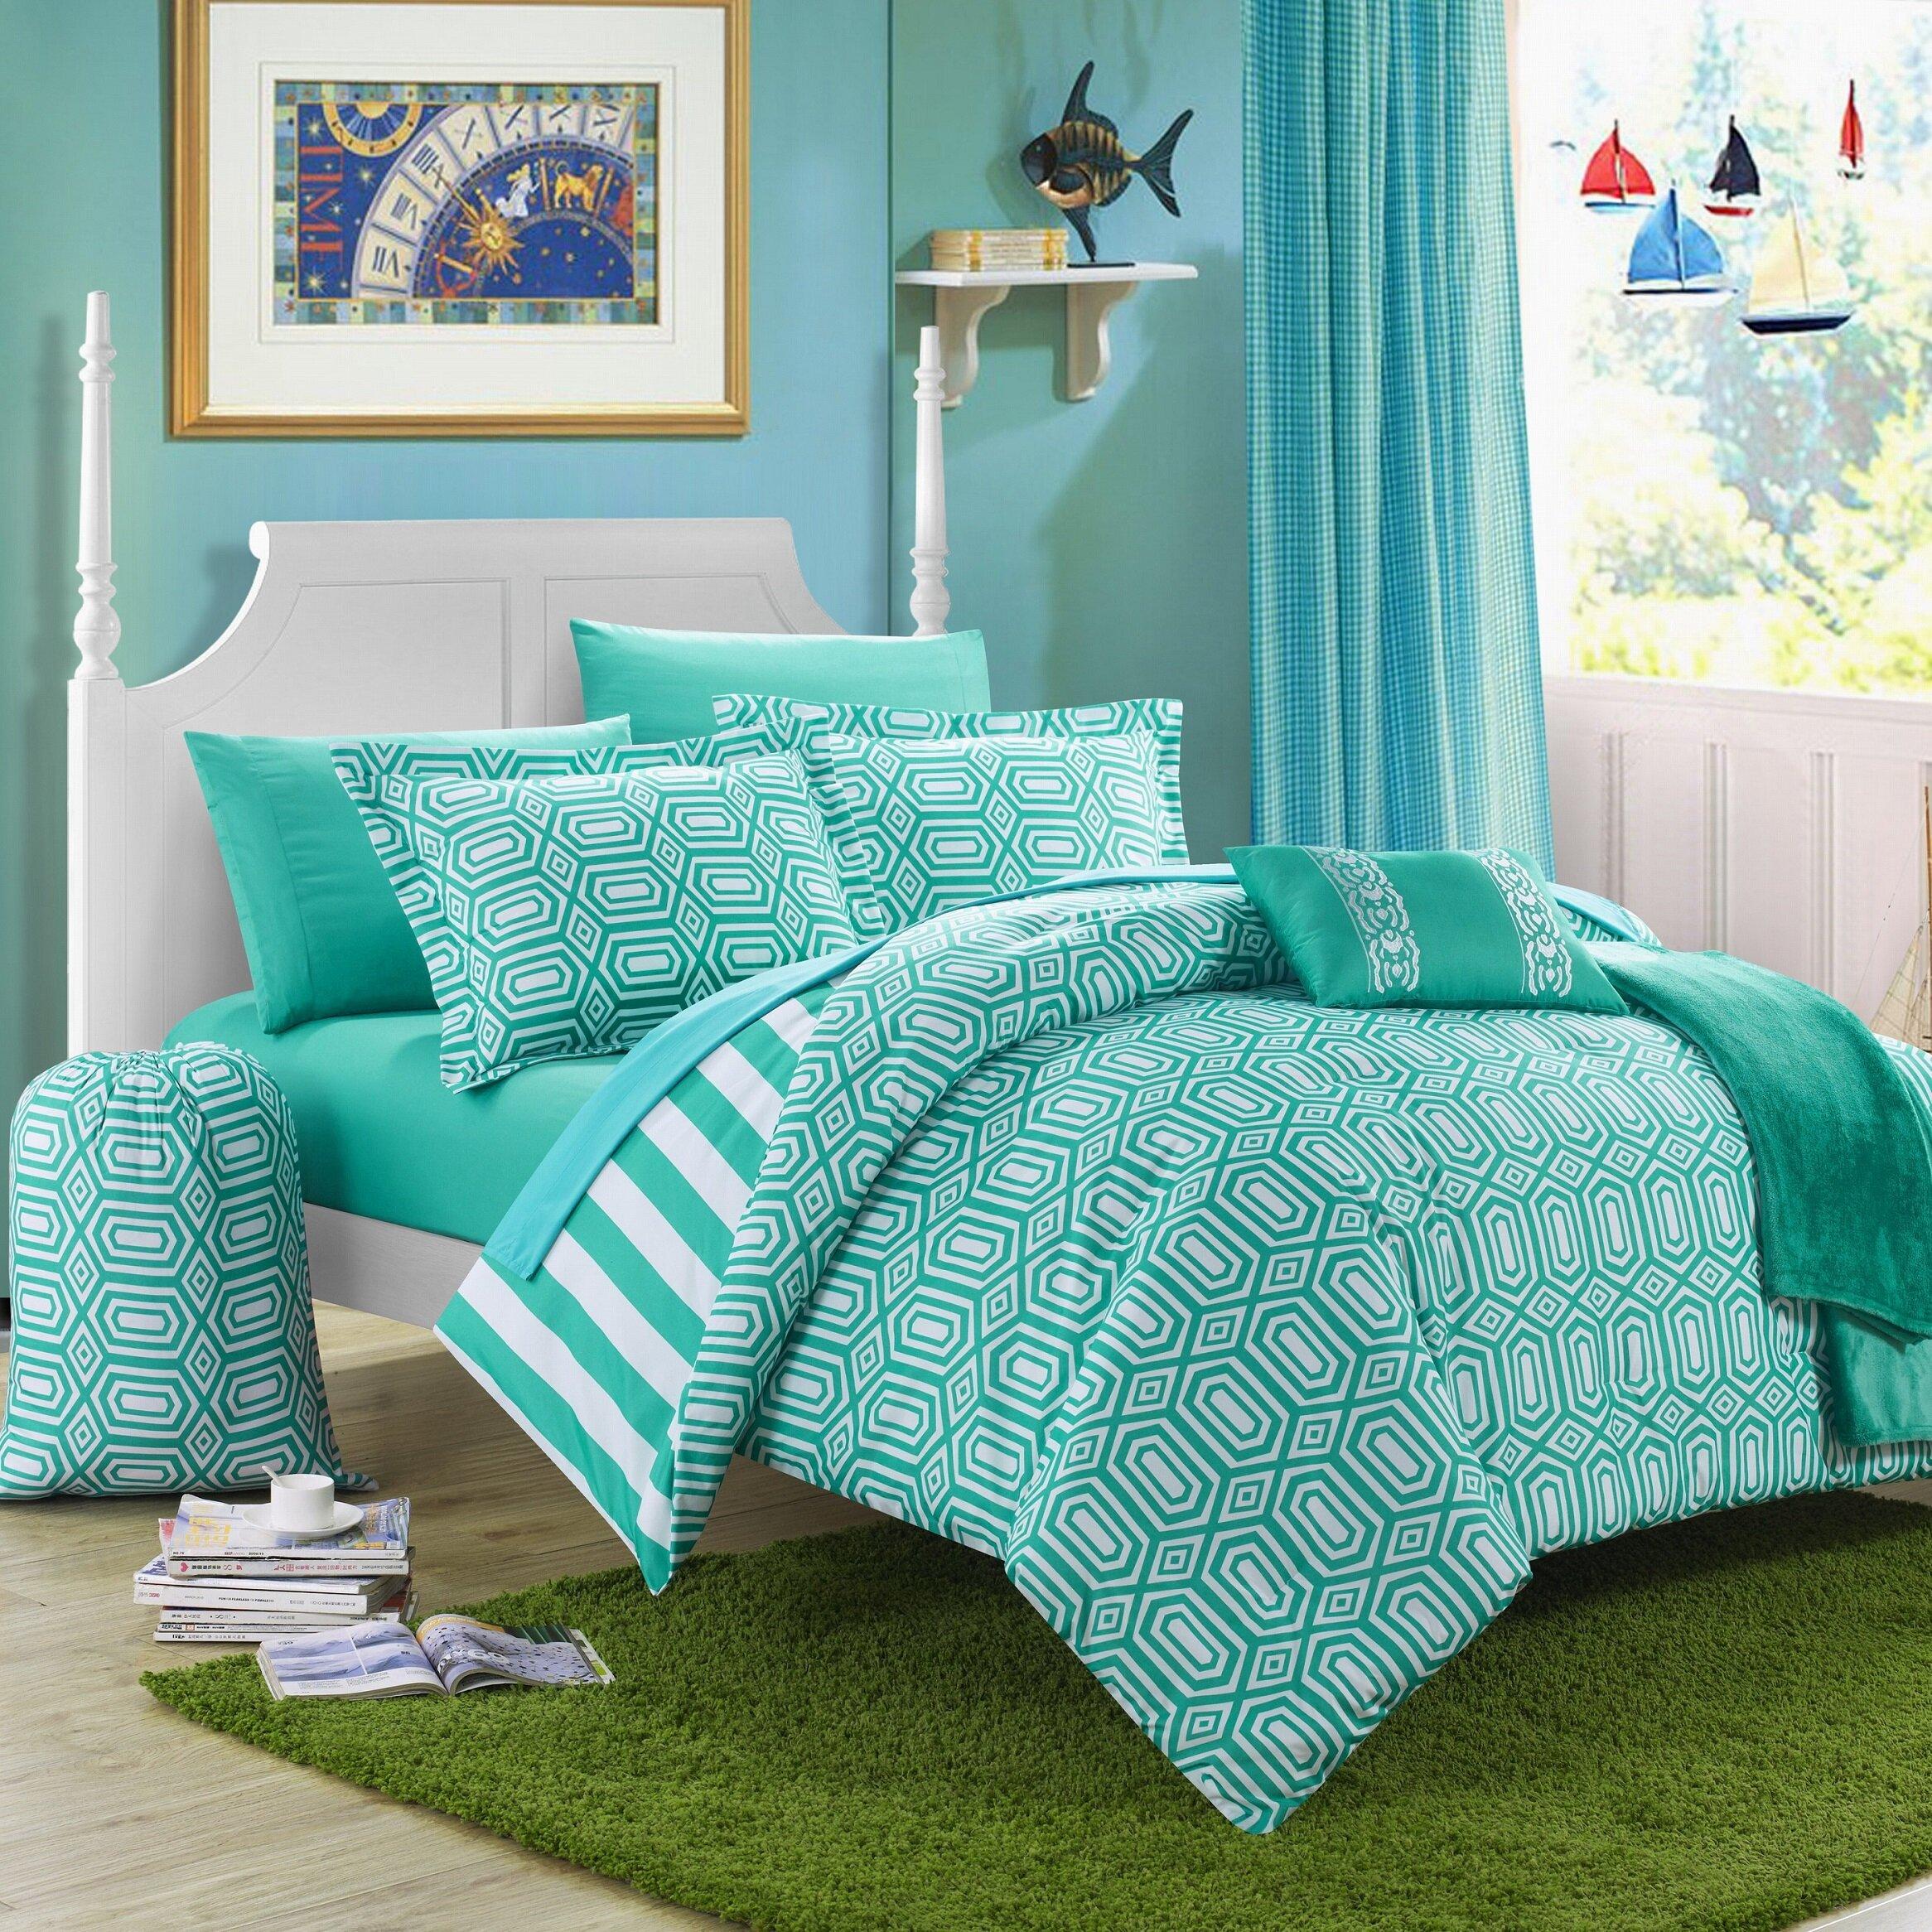 paris 10 piece comforter set wayfair. Black Bedroom Furniture Sets. Home Design Ideas